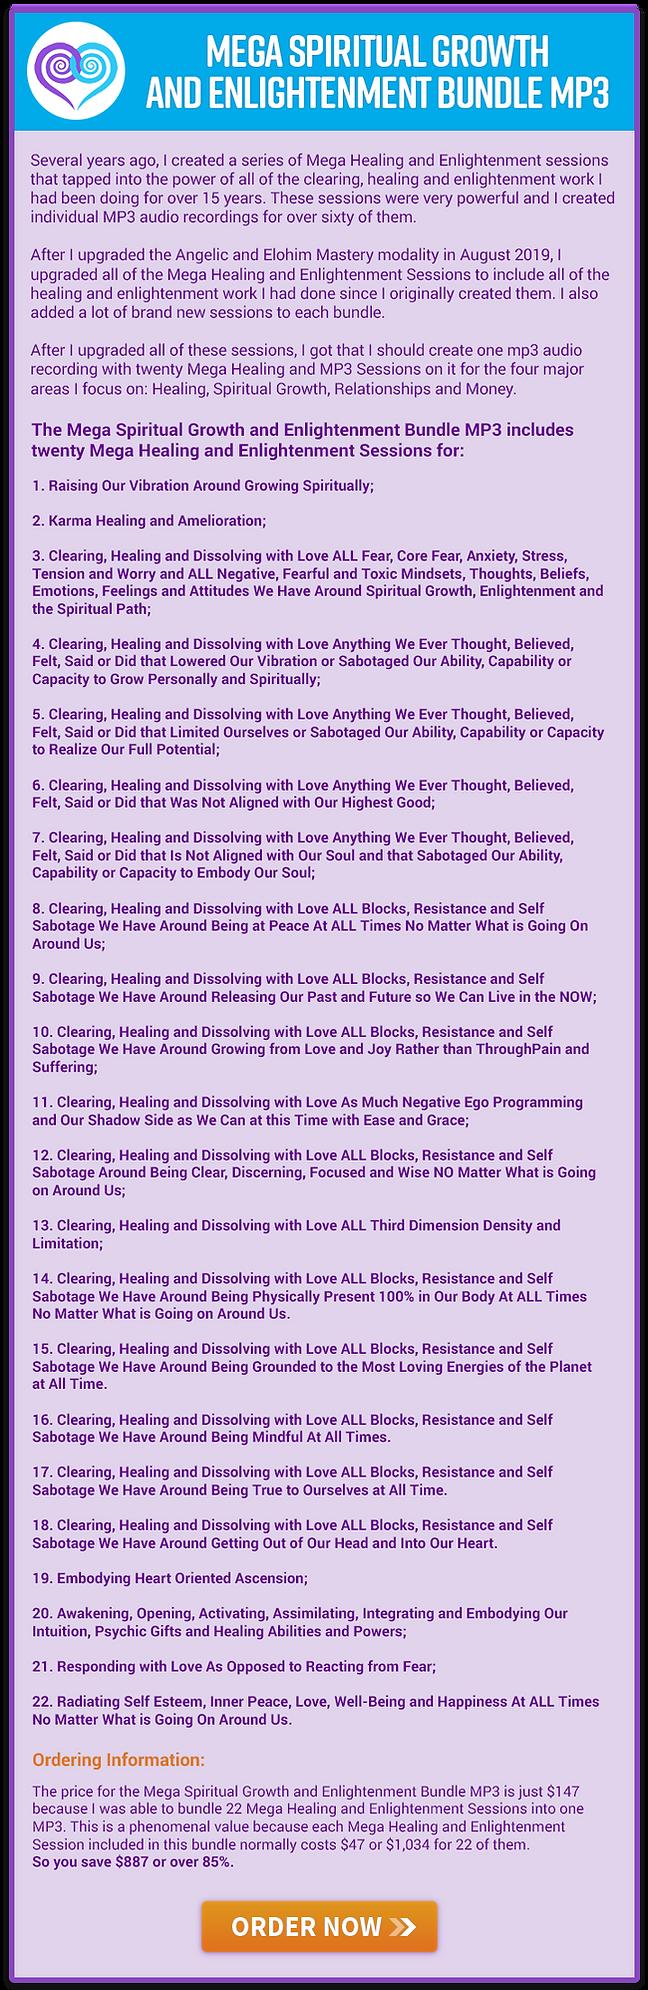 rsz_mega-spiritual-growth-enlightenment-